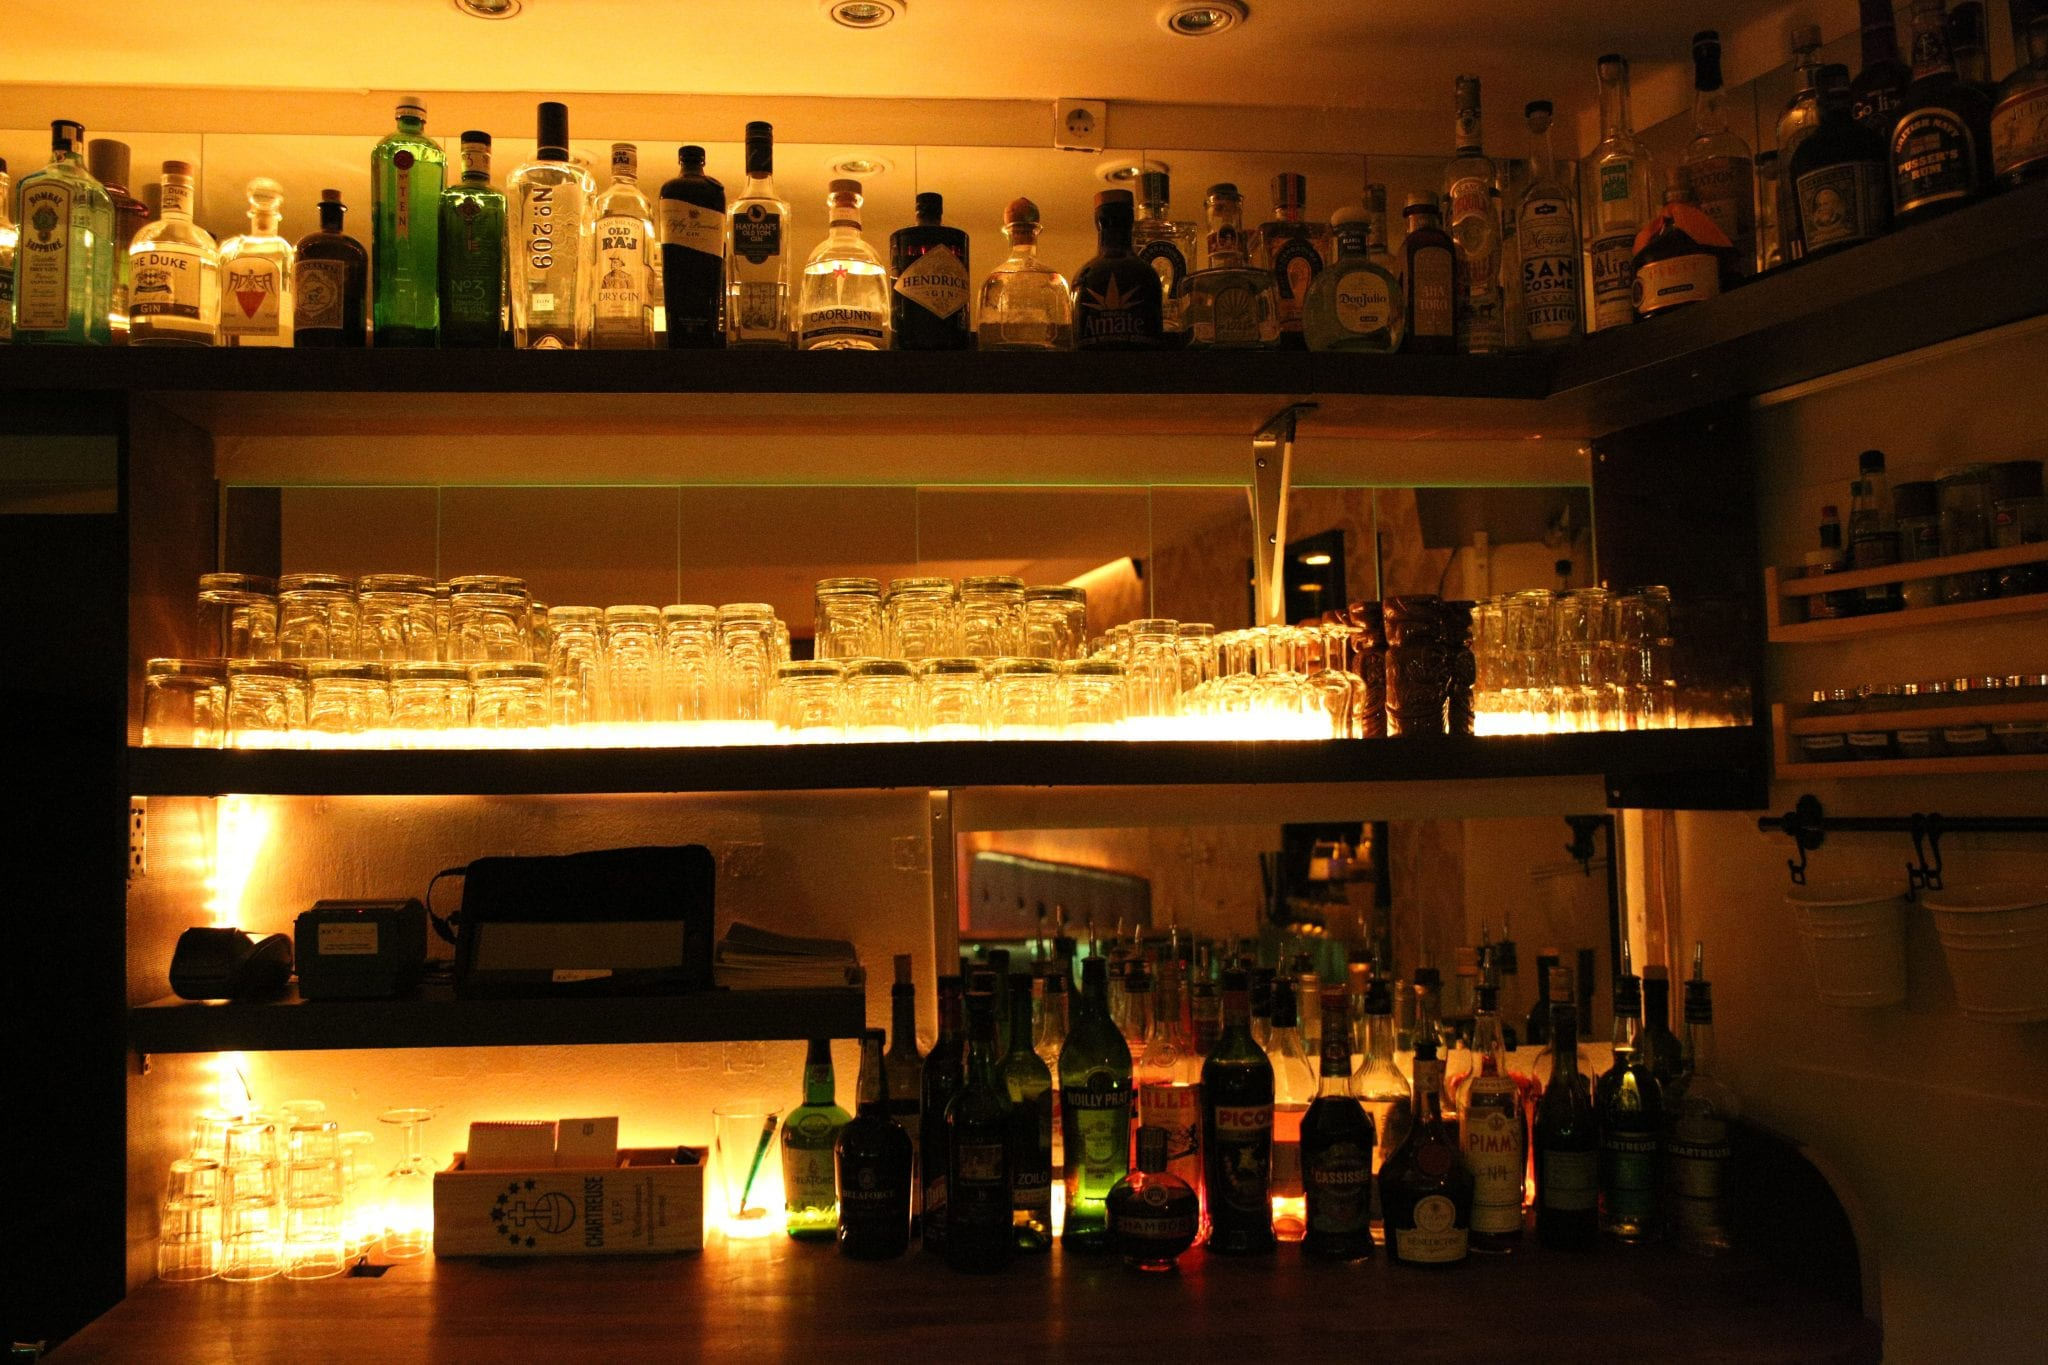 Die vintage bar n rnberg kleinod in der altstadt mixology for Bar 42 nurnberg